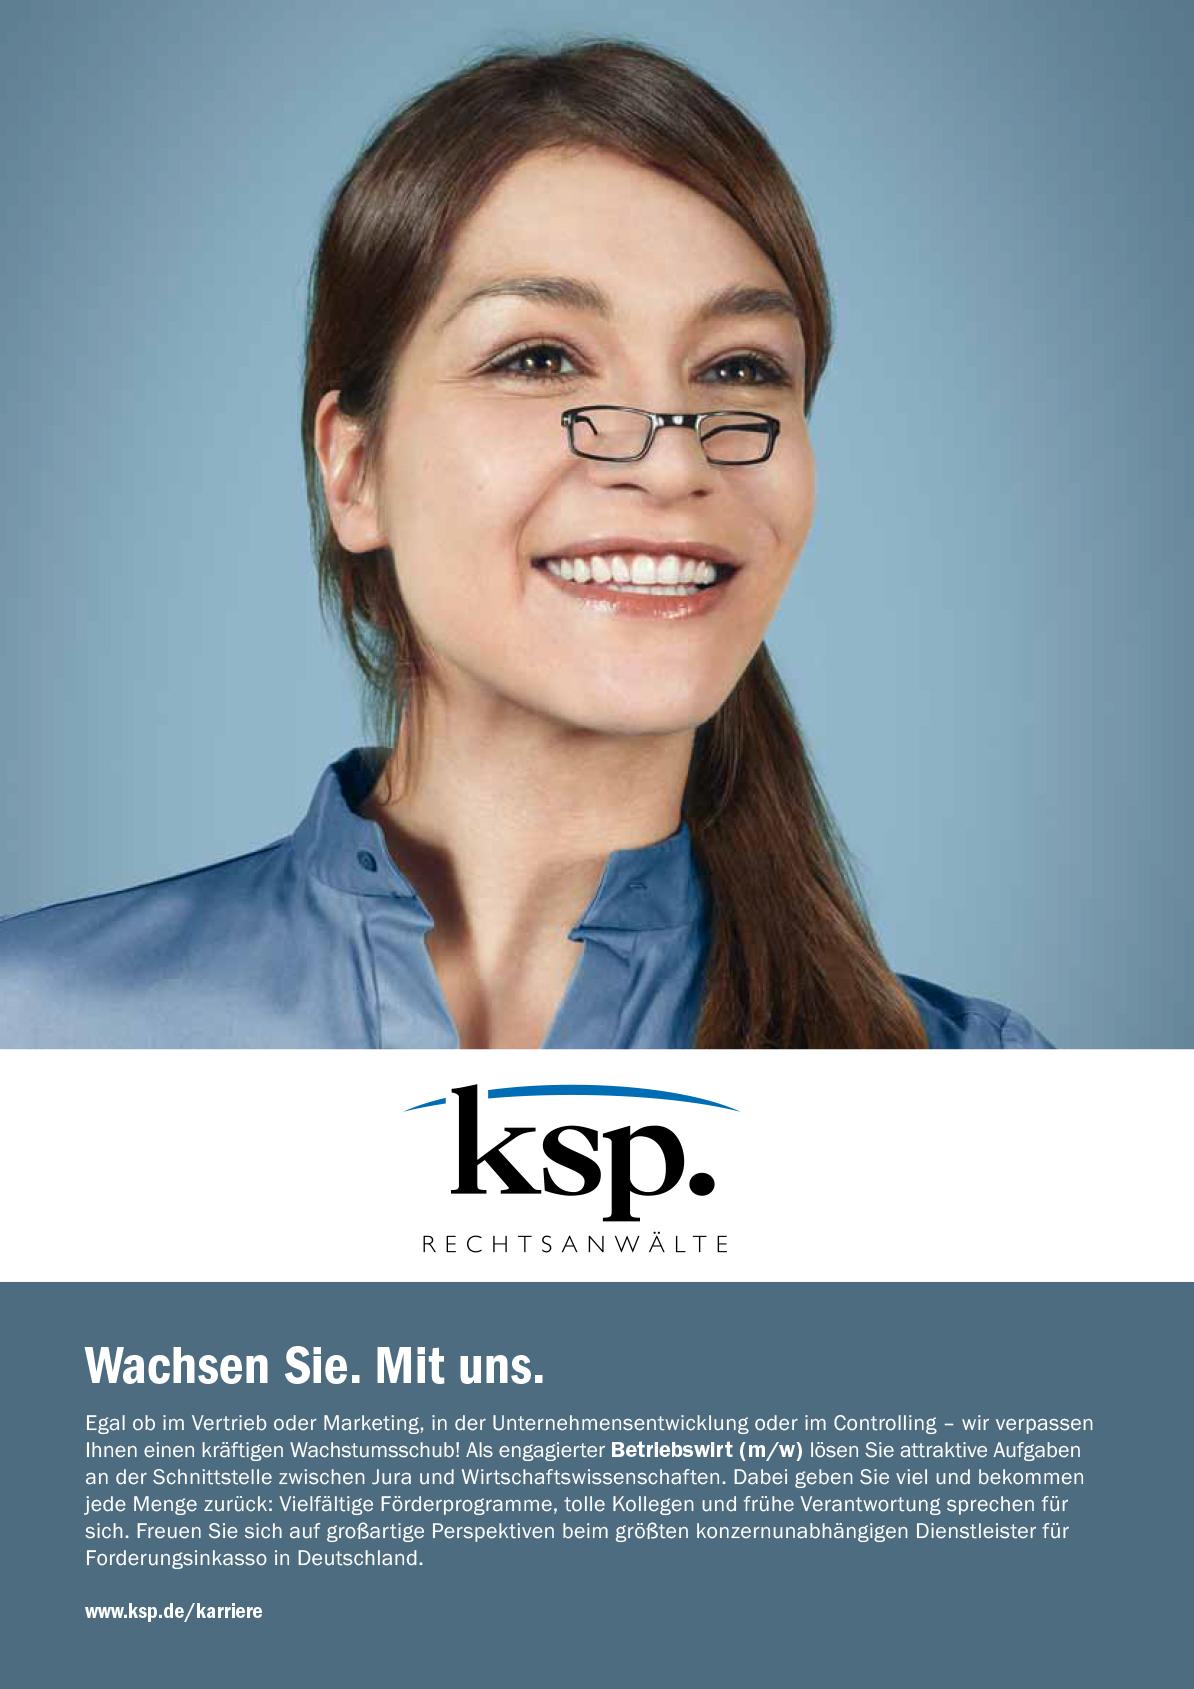 KSP_1